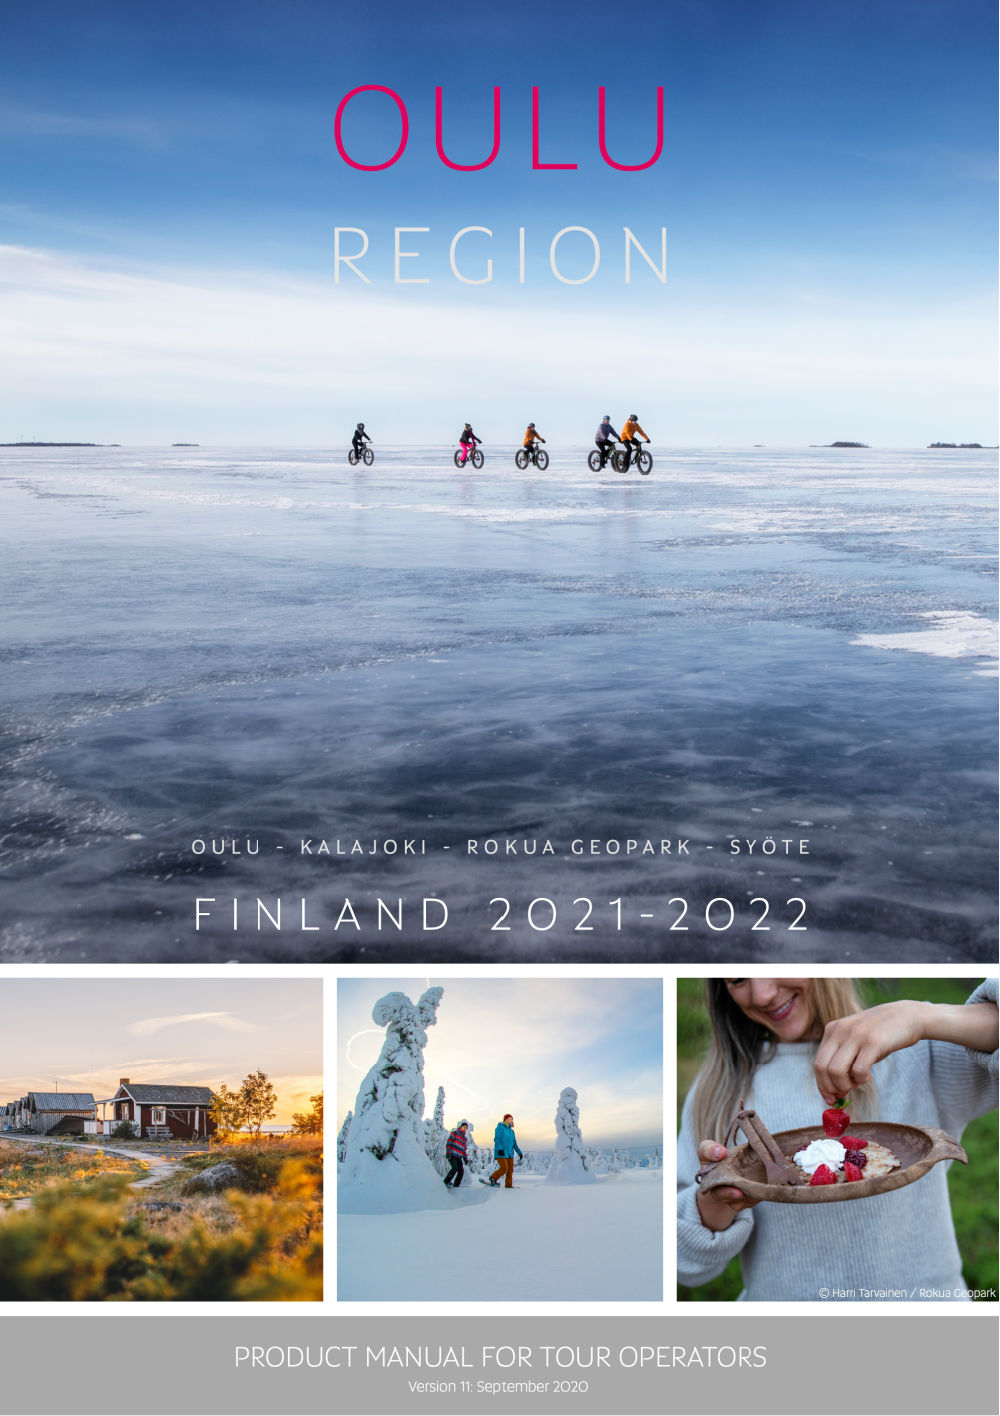 Product manual Oulu Region Finland 2021-2022